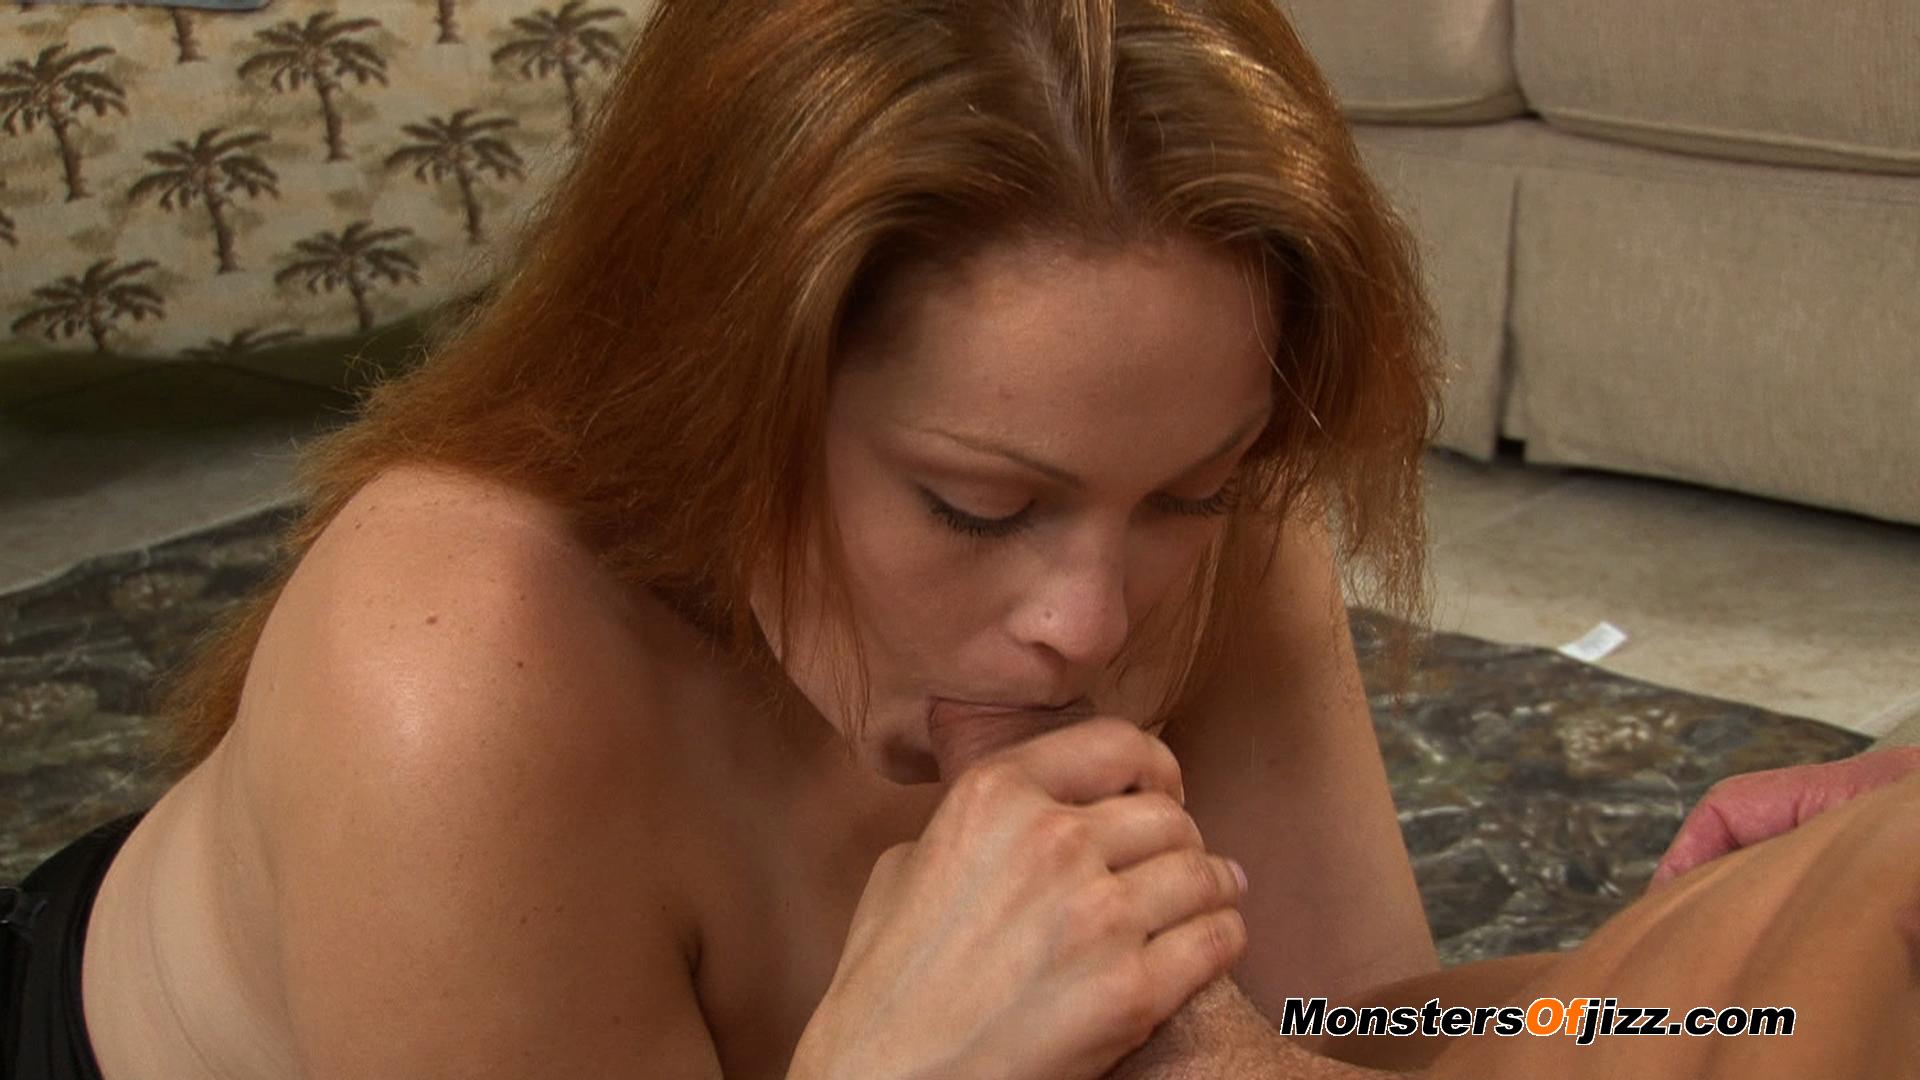 Great body hot girl dabal porn